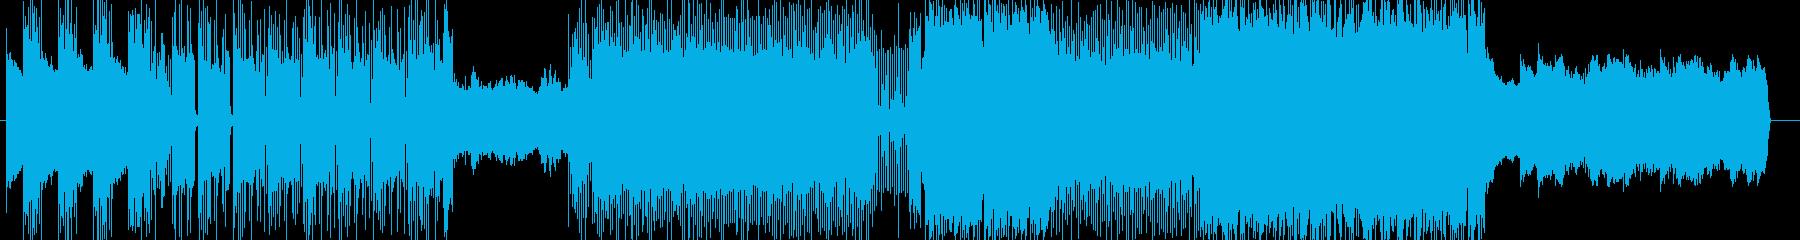 「HR/HM」「DARK系」BGM19の再生済みの波形